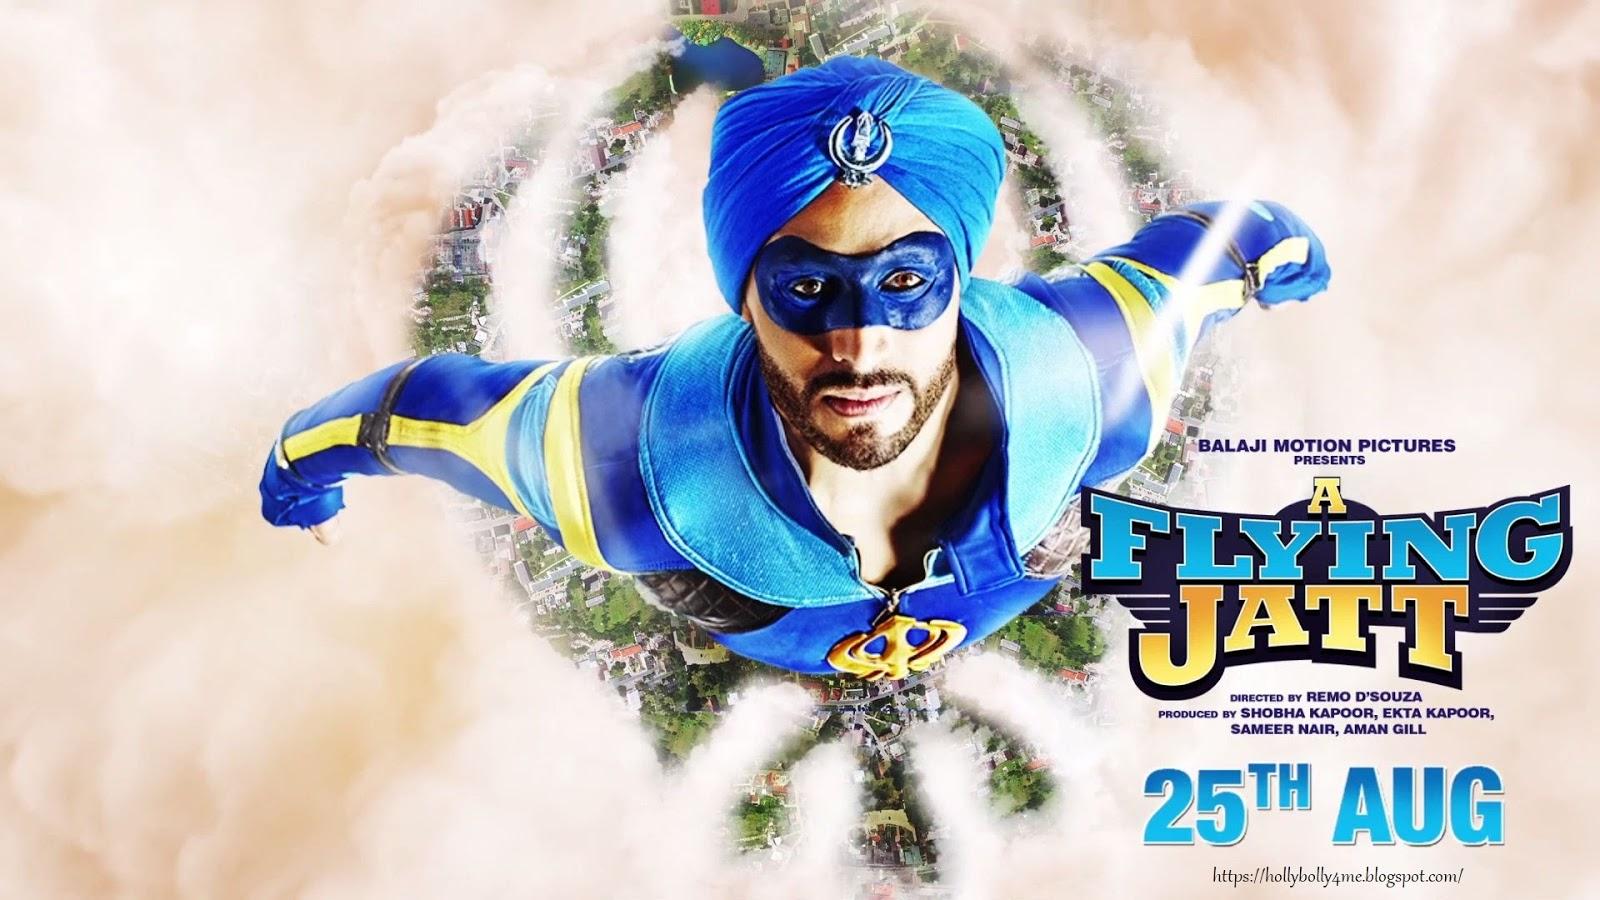 A Flying Jatt 2016 Full Movie Hollybolly4me Holly Bolly 4 Me